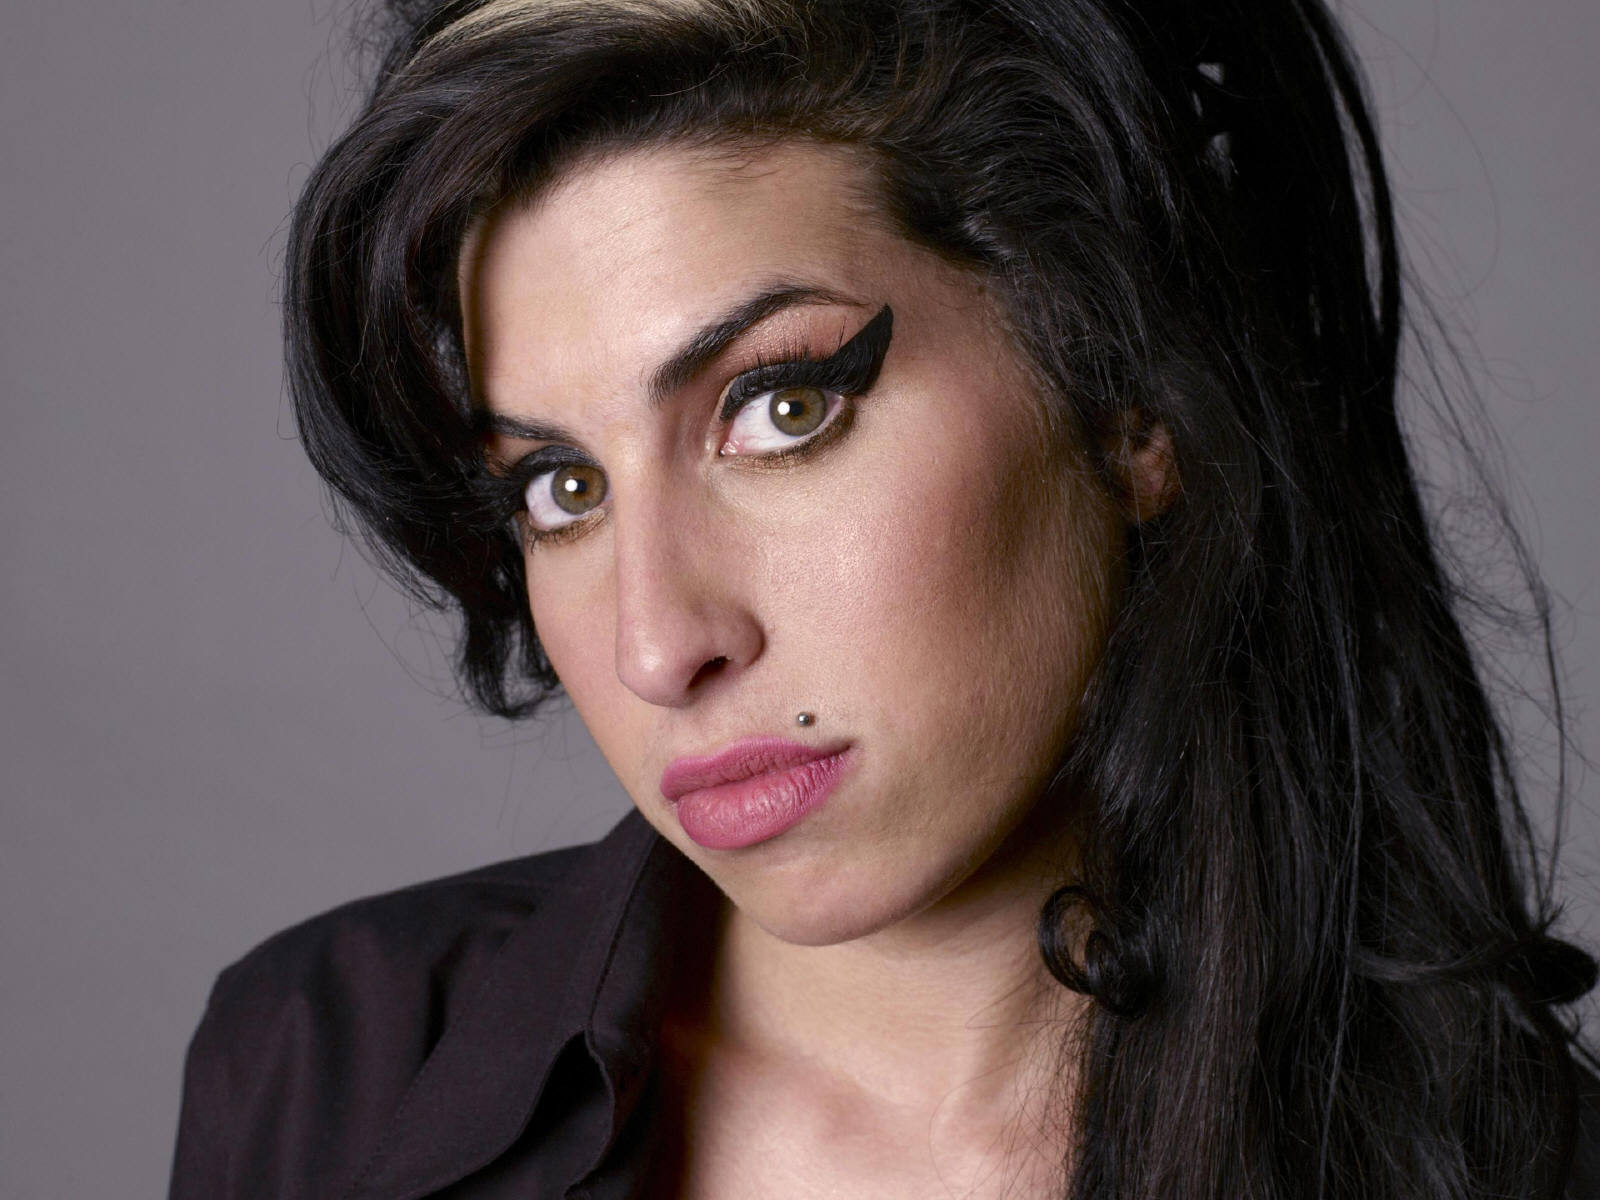 http://1.bp.blogspot.com/-iBU7aVo8QY0/Tox2za8VIeI/AAAAAAAABTM/8WEivAAwPYI/s1600/Amy_Winehouse_0005_1600X1200_Wallpaper.jpg